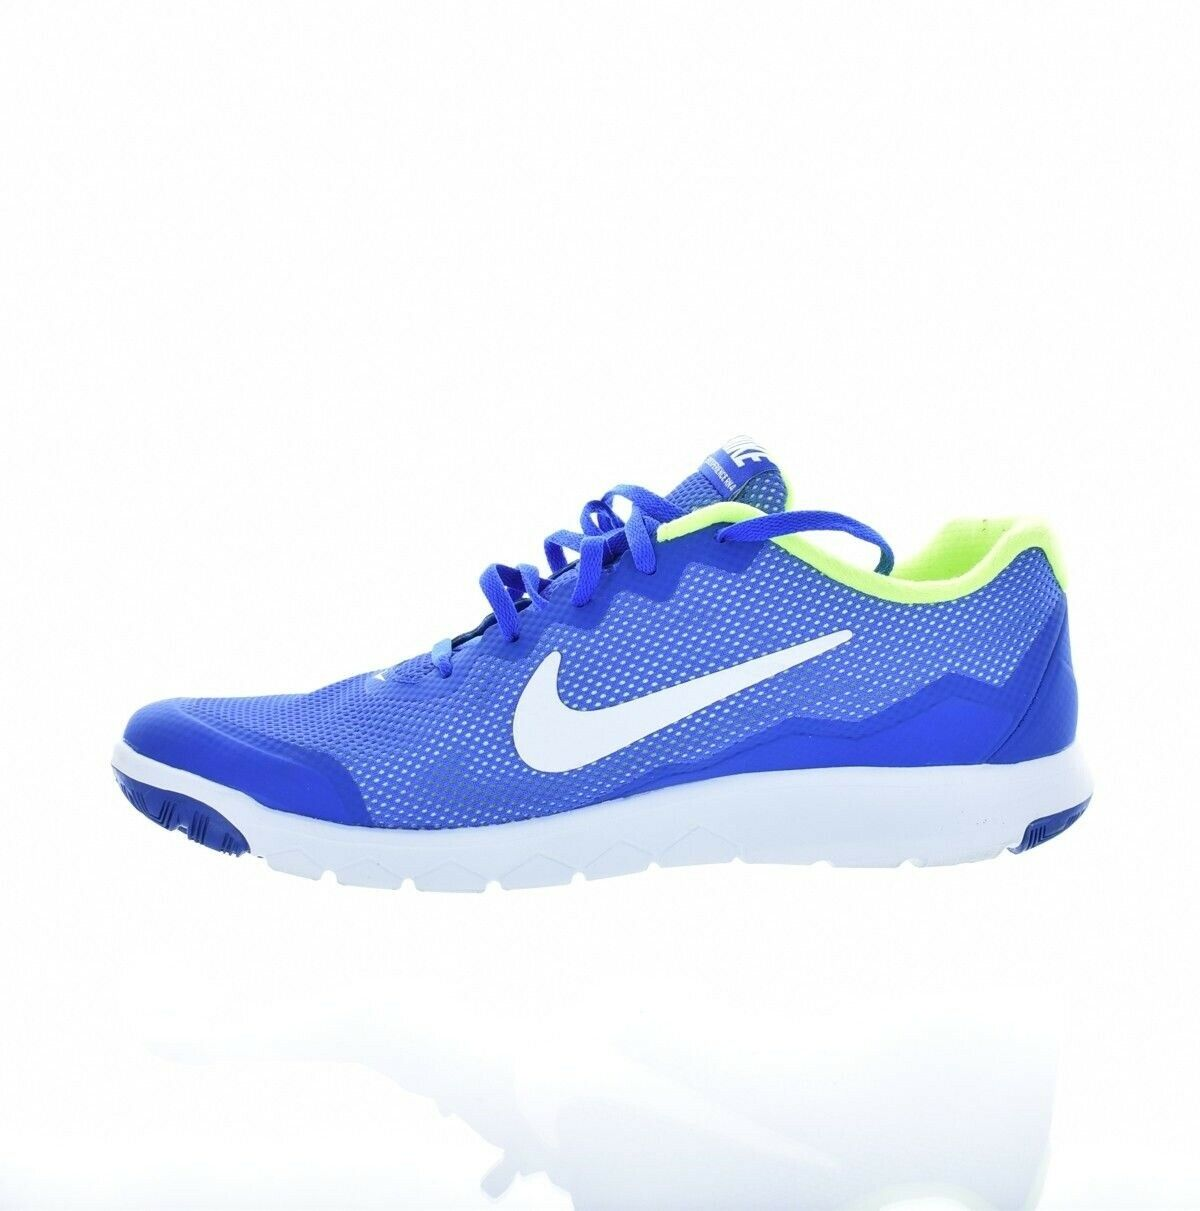 Nike Mens bluee White Volt Flex Experience Rn 4 Running shoes 10.5 Medium